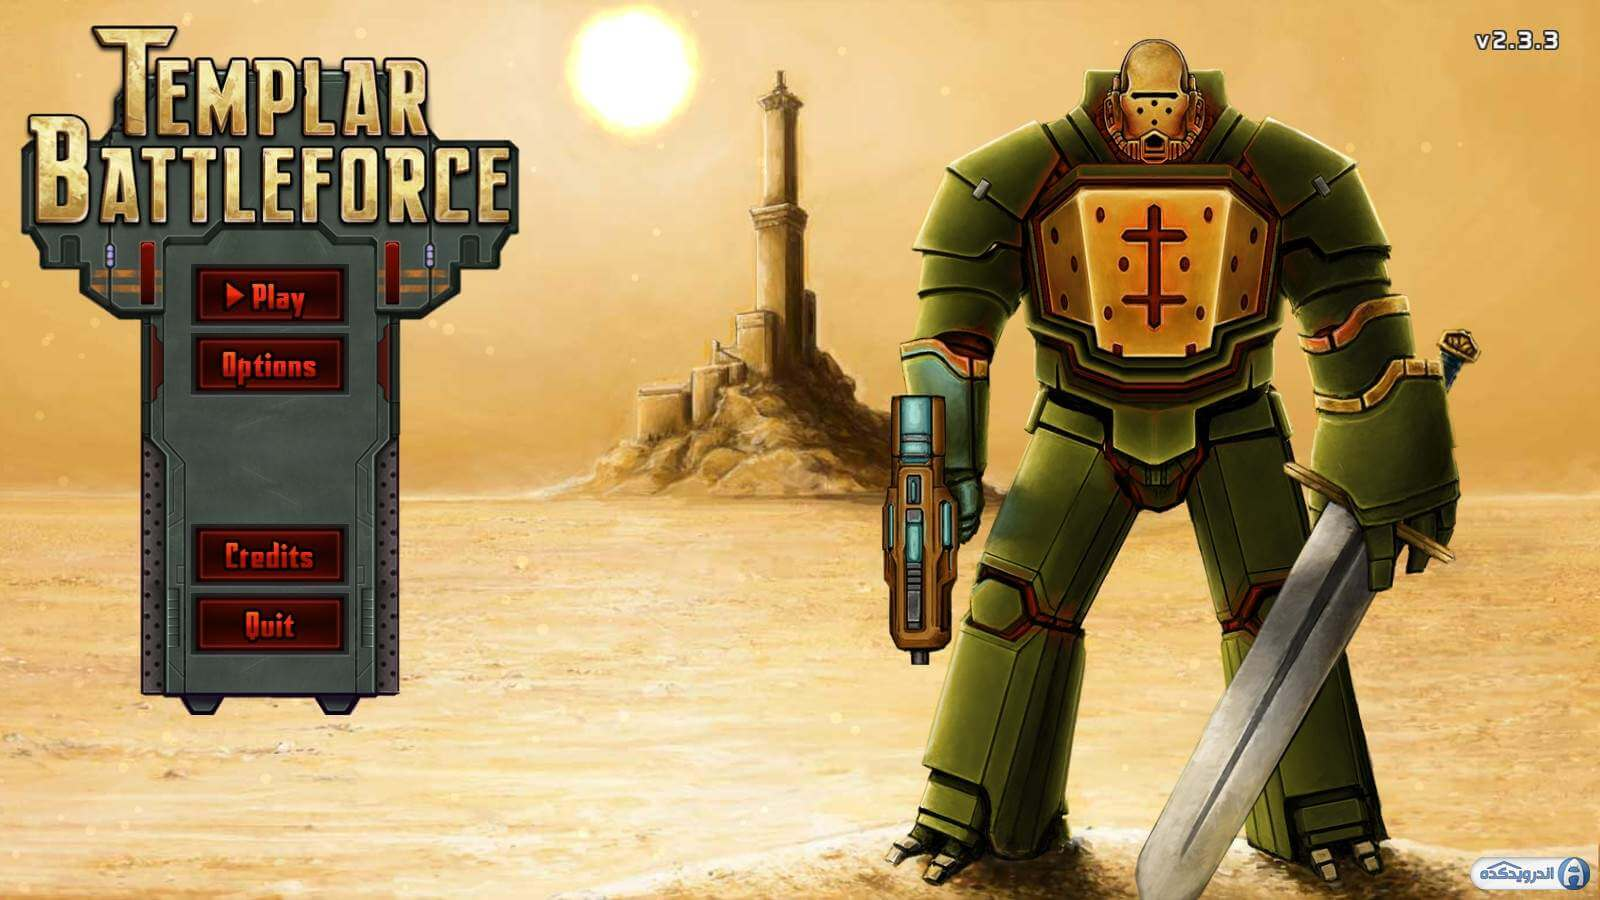 templar battleforce rpg irnab ir دانلود بازی نابودی پناهگاه Templar Battleforce RPG v2.6.43 اندروید